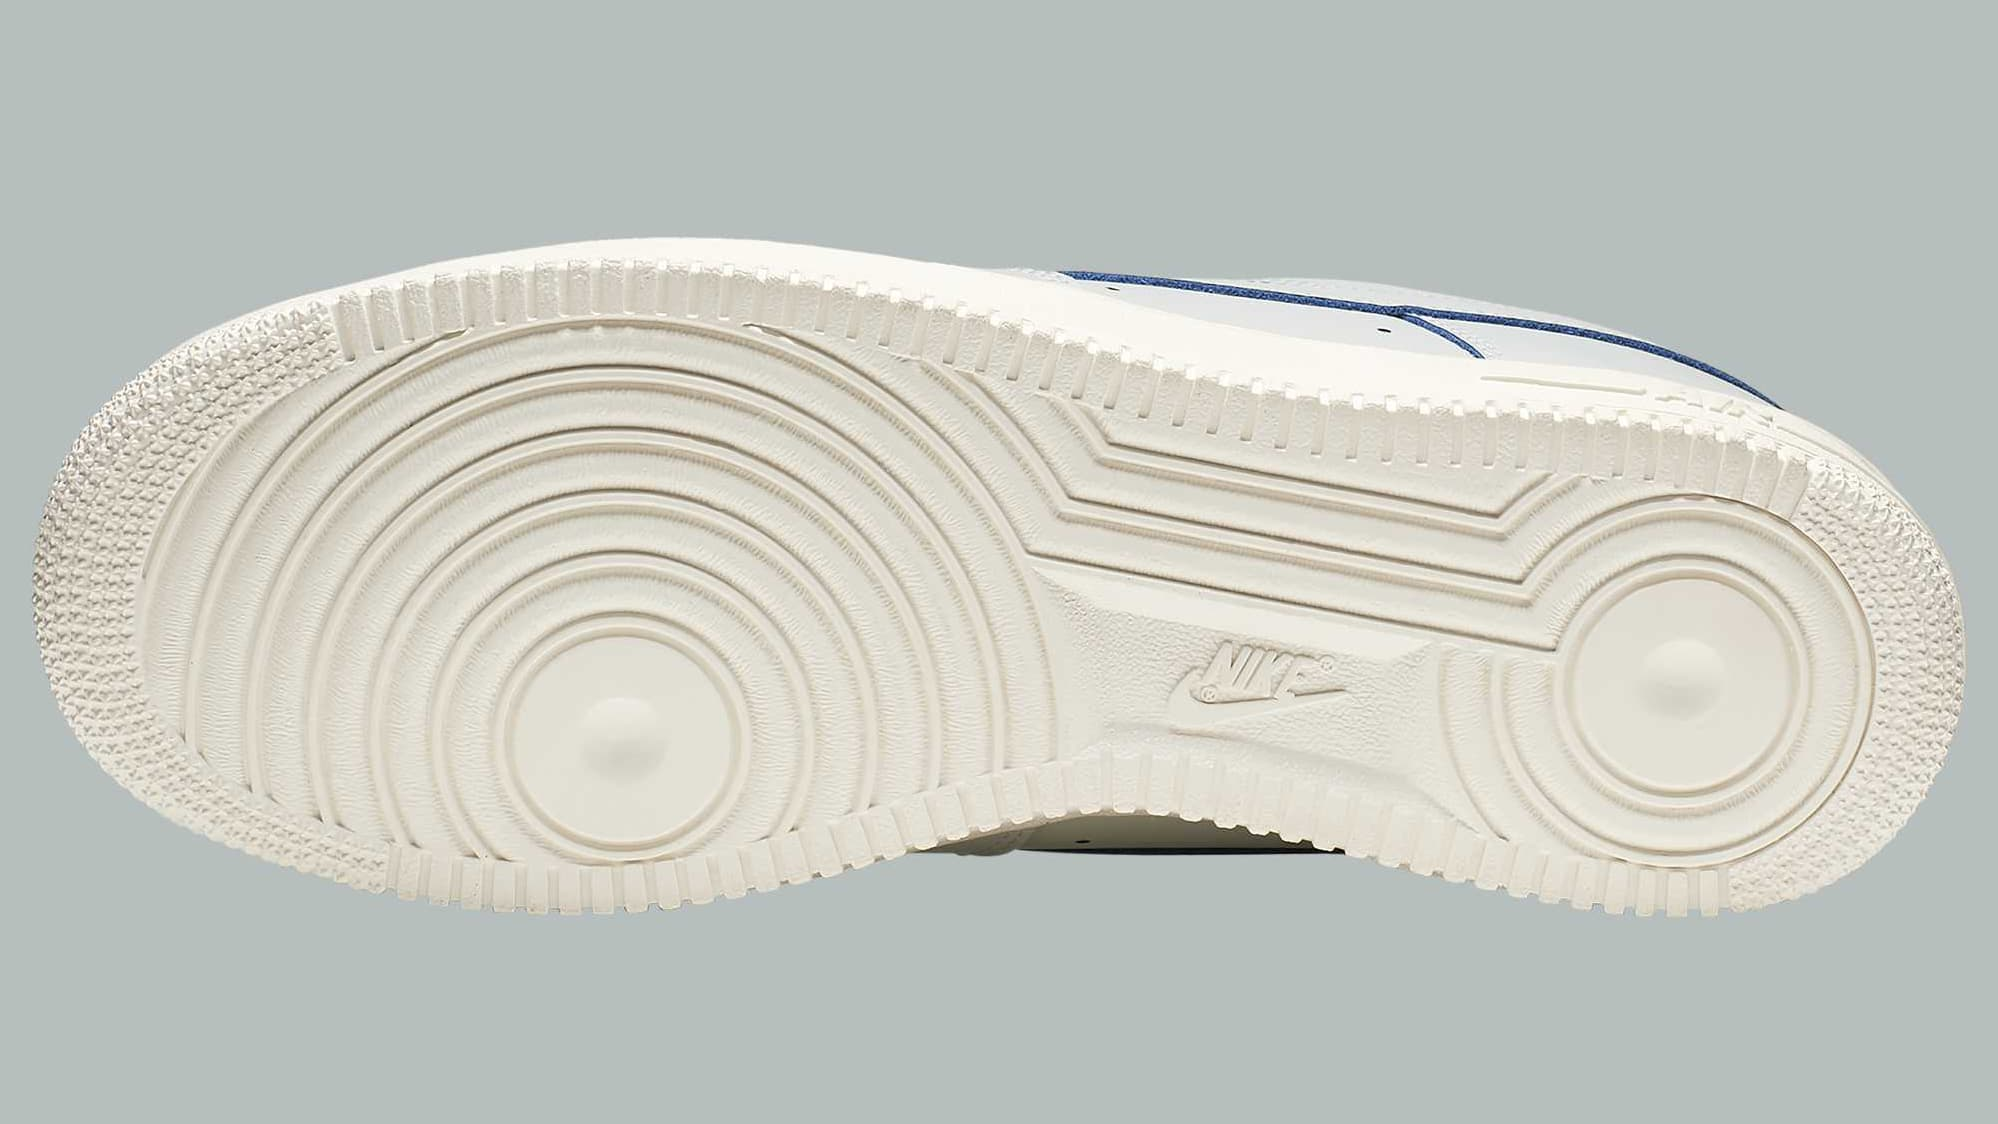 Nike Air Force 1 Low Devin Booker Release date AJ9716-001 Sole